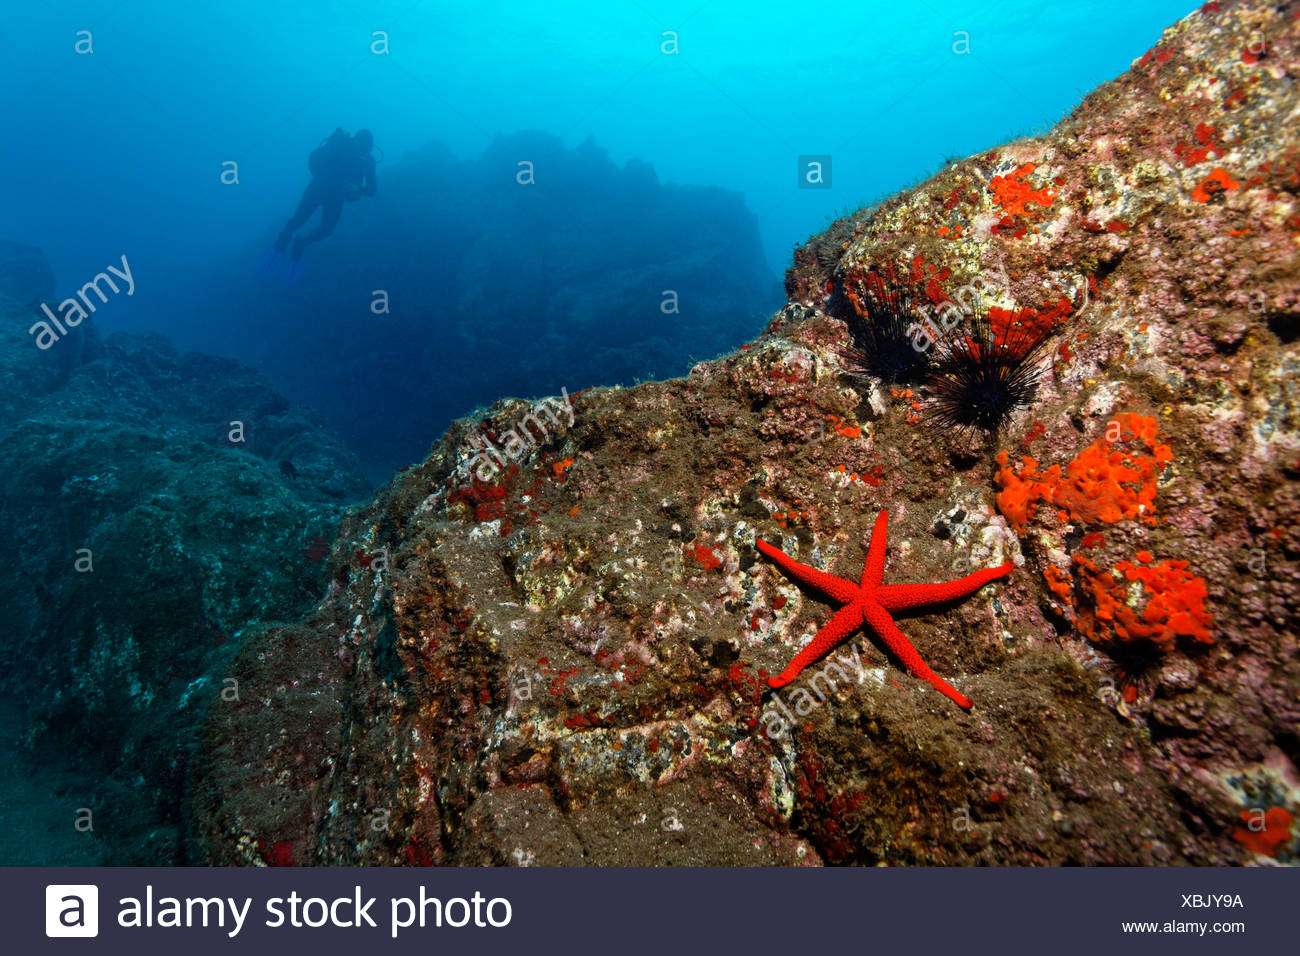 Paisajes submarinos rocosos, Estrella de mar roja (Echinaster sepositus), Acorn percebes (Balanus trigonus), Scuba Diver, Madeira Foto de stock